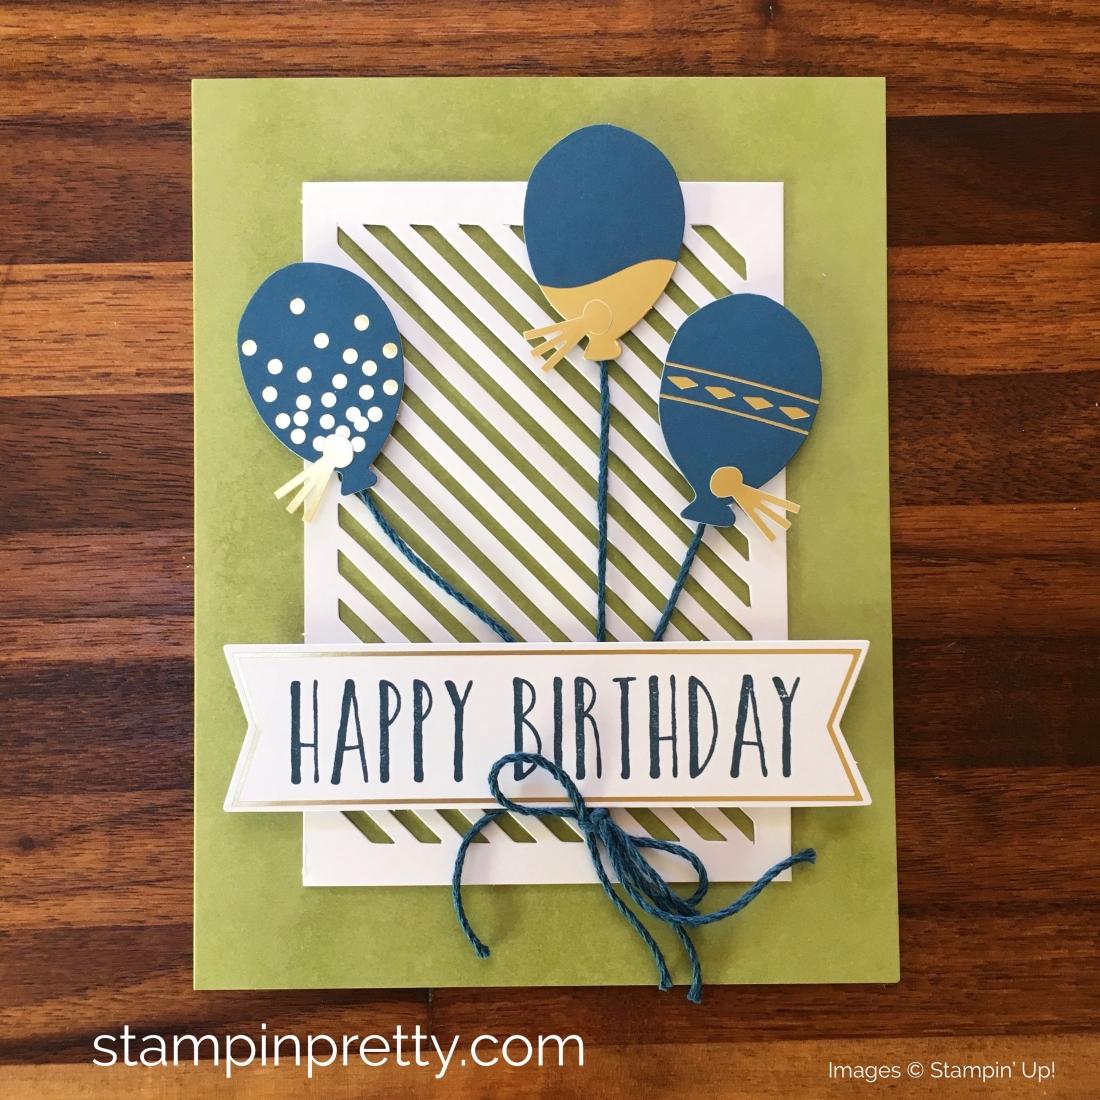 16 Birthday Cards In A Flash!